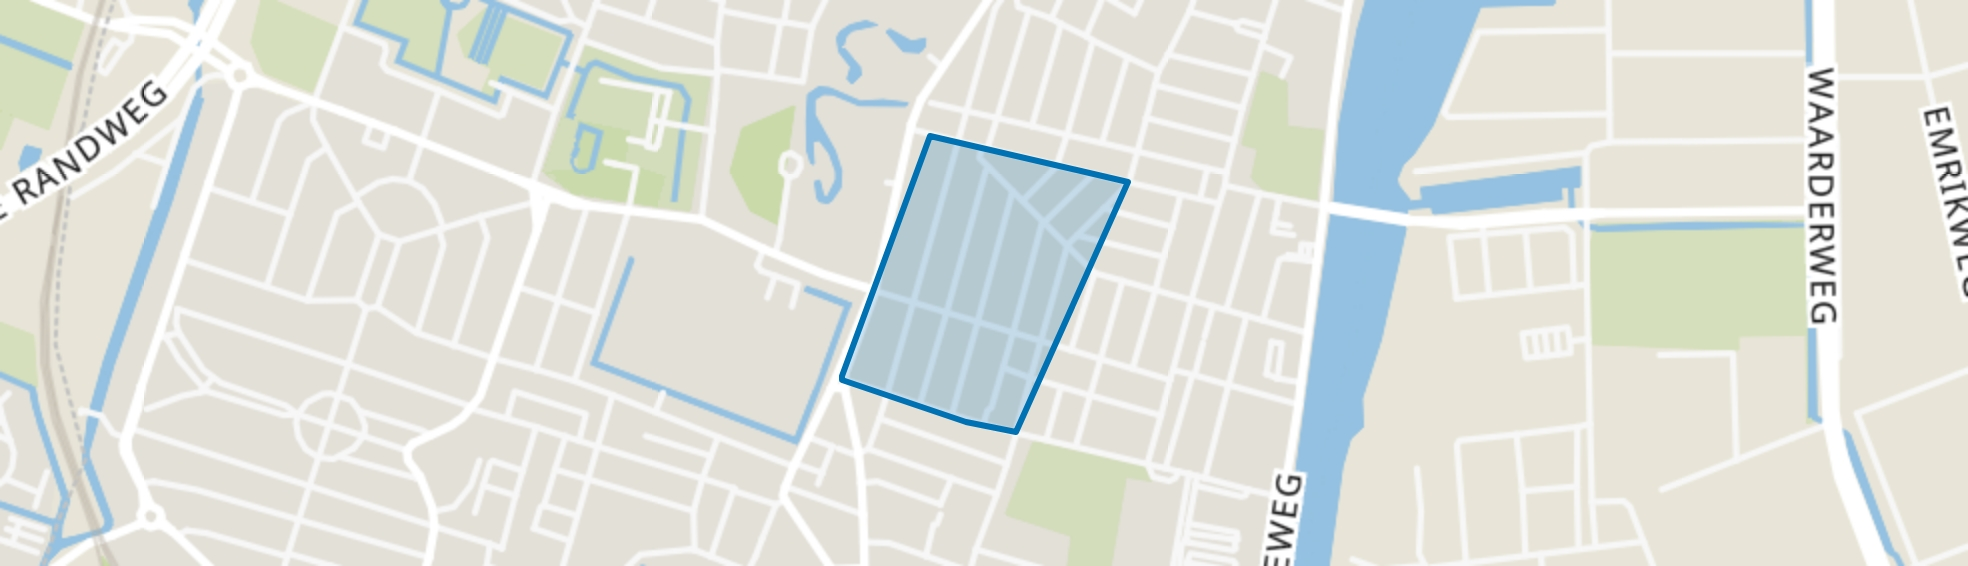 Generaalsbuurt, Haarlem map